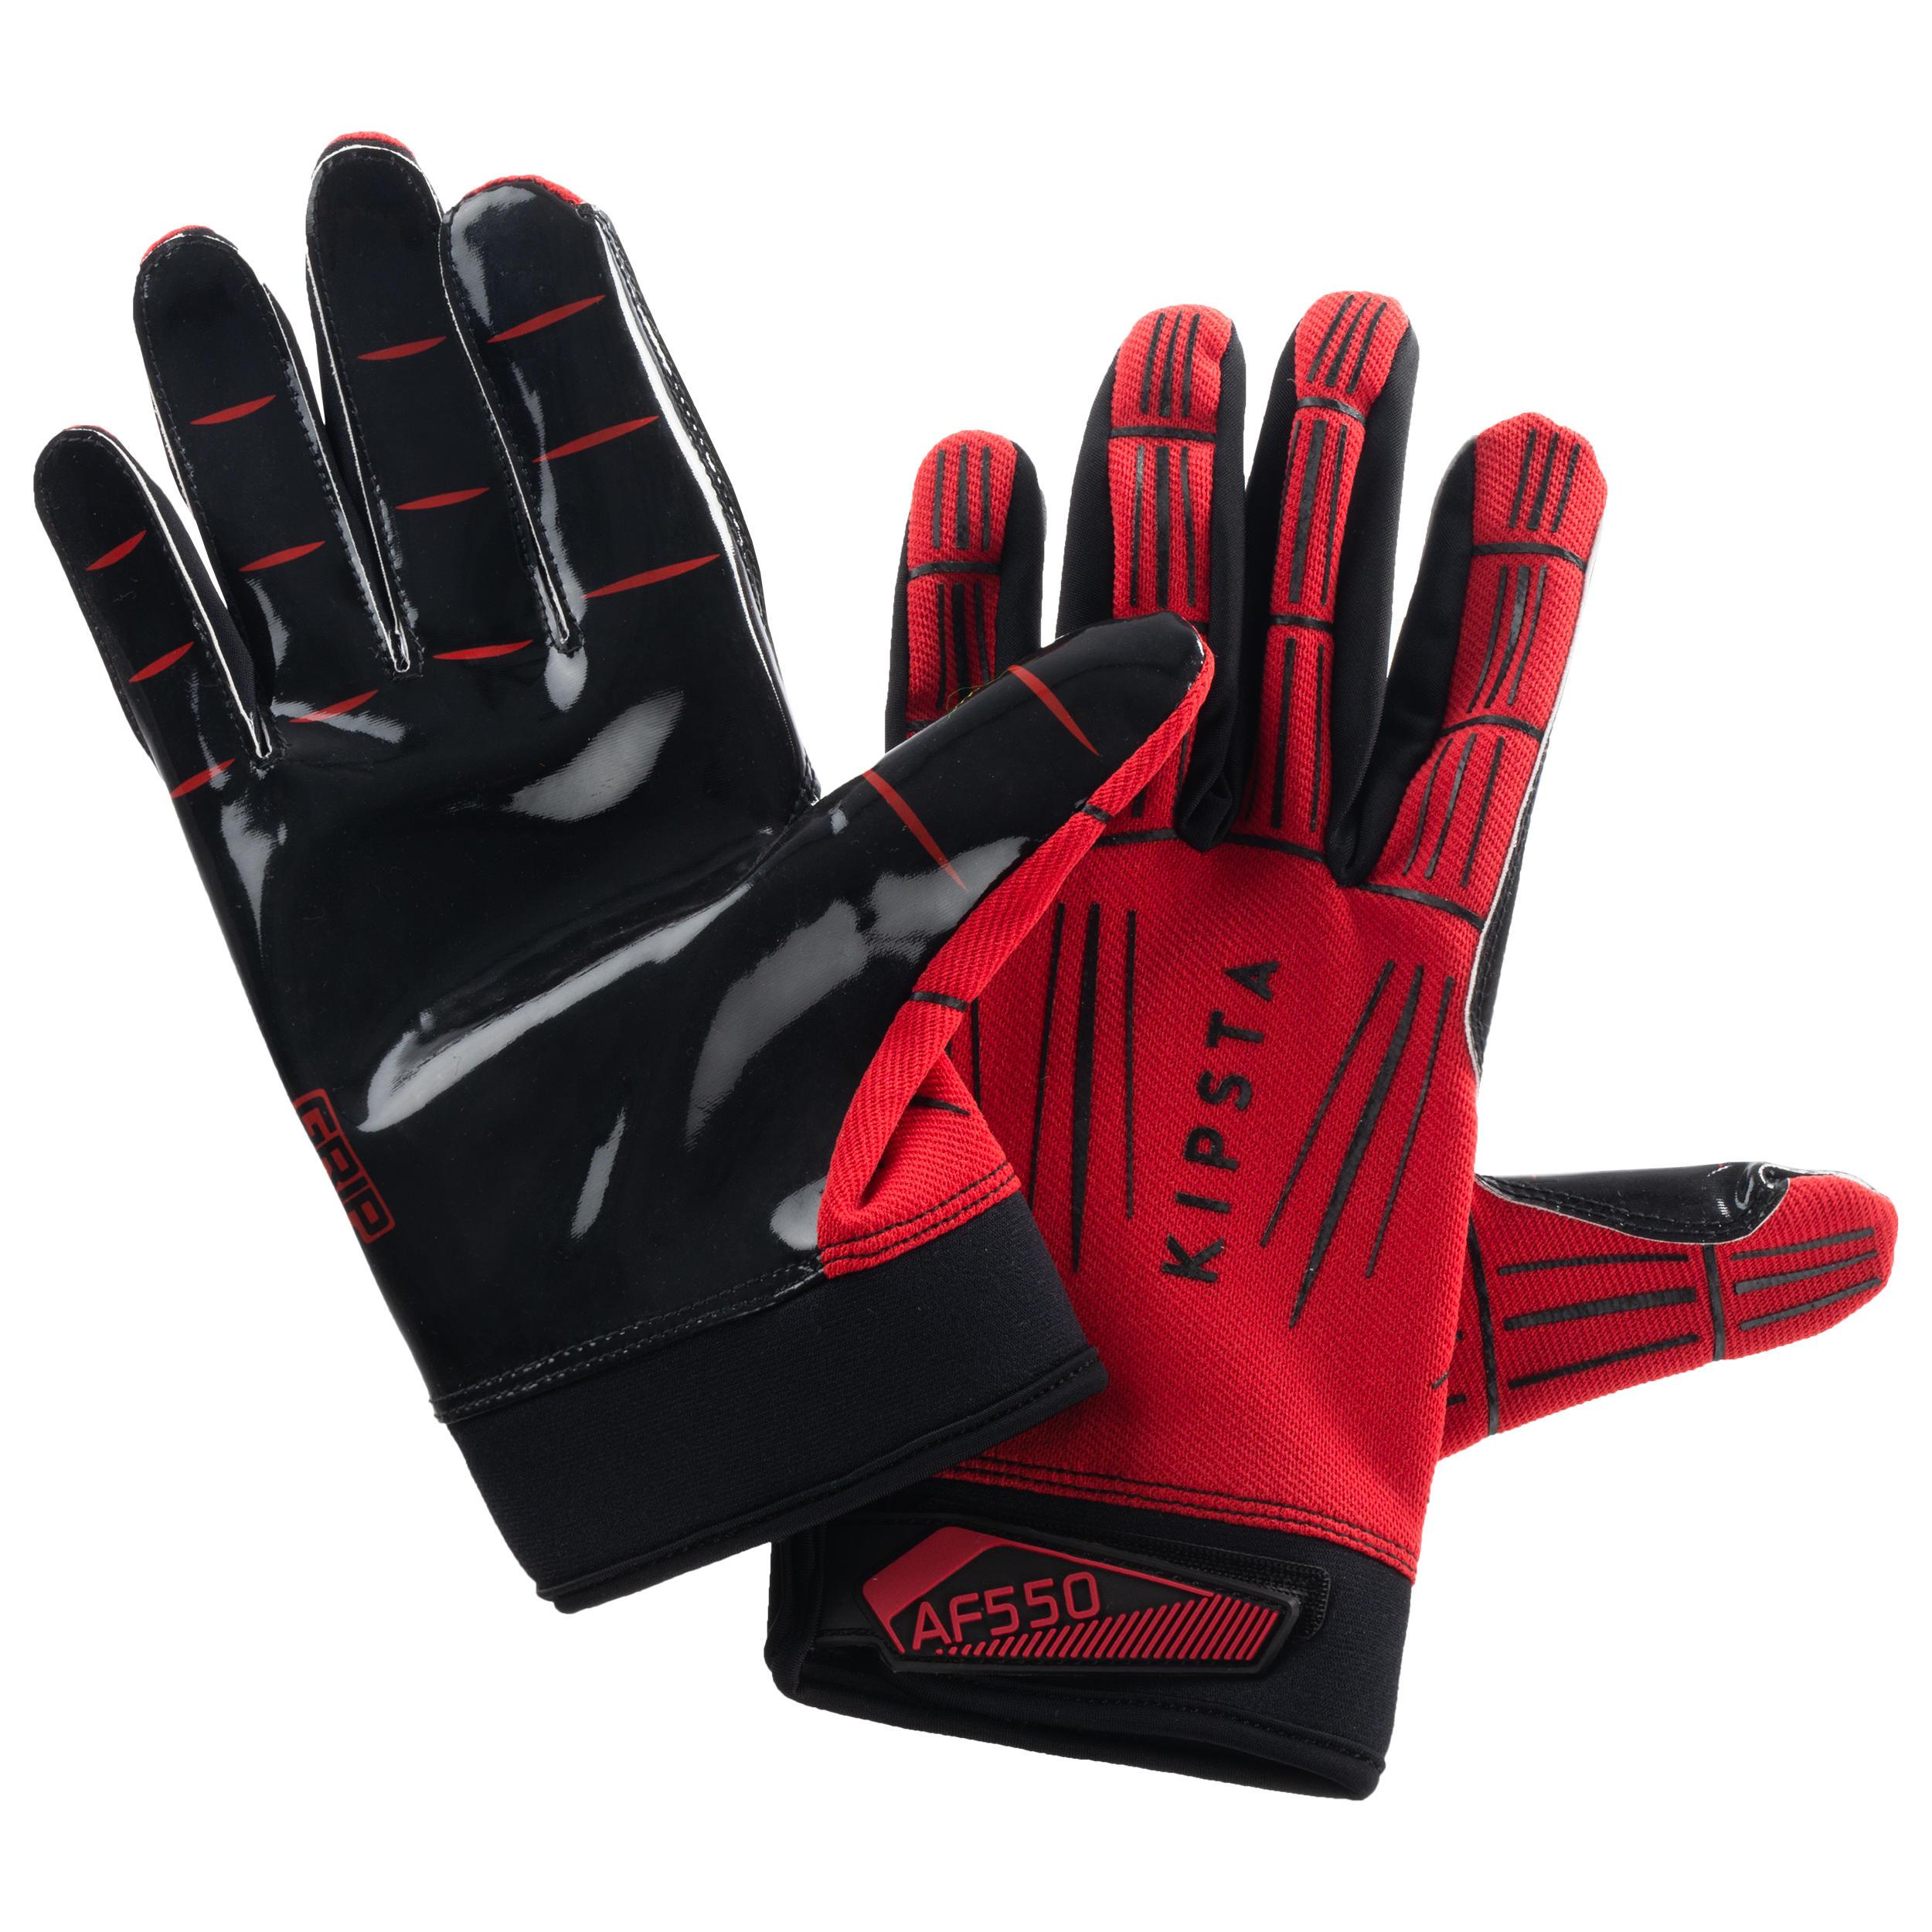 Mănuși fotbal american 550 G la Reducere poza